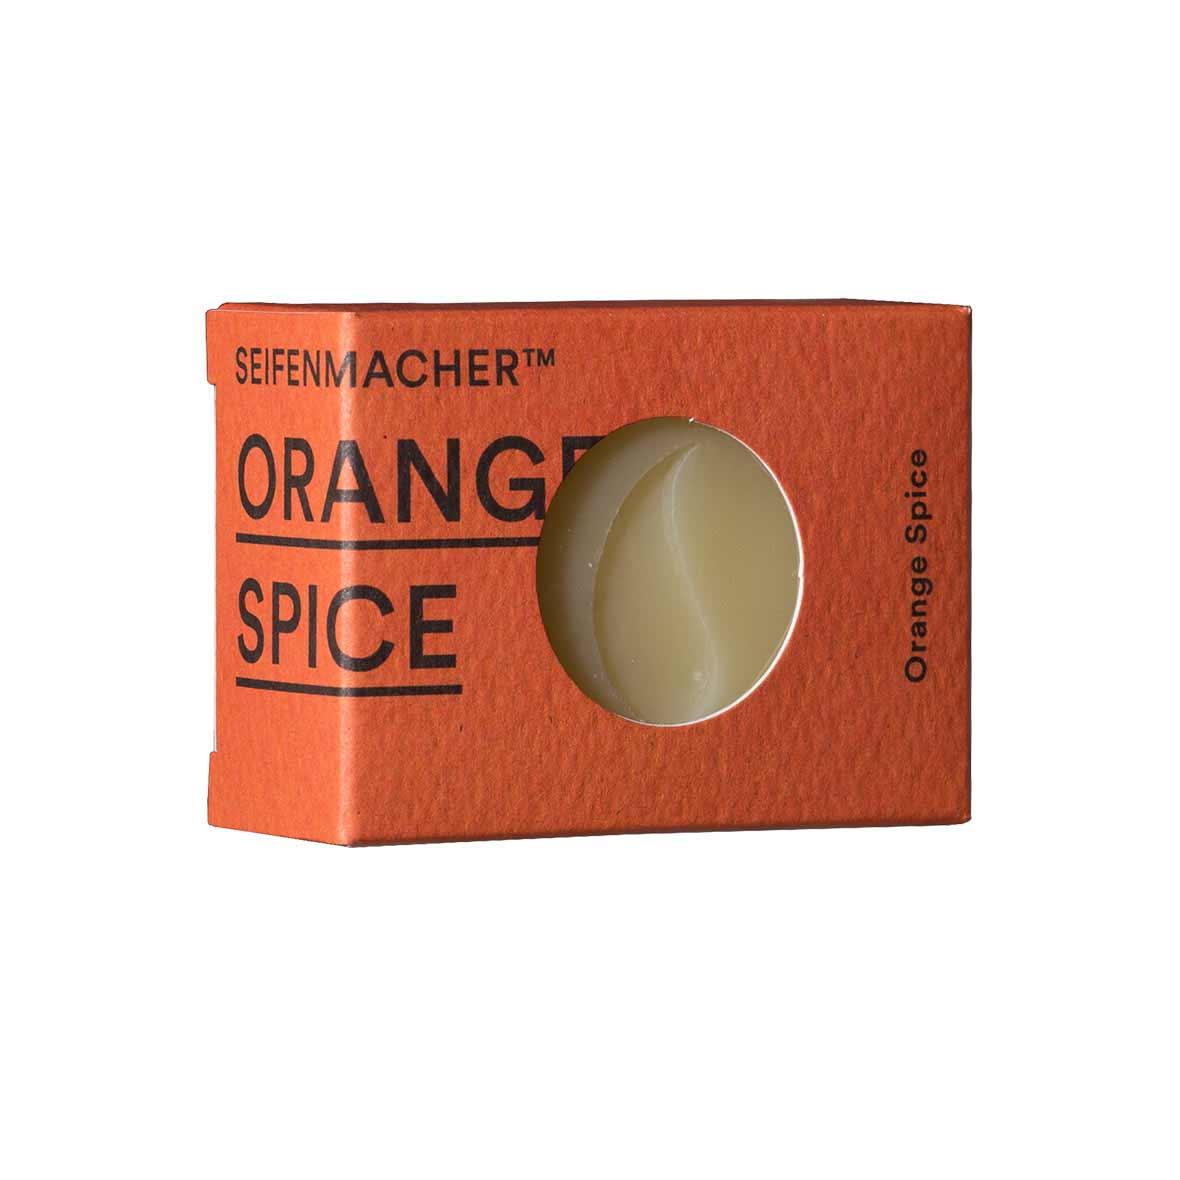 Handgemachte Naturseife Orange-Spice